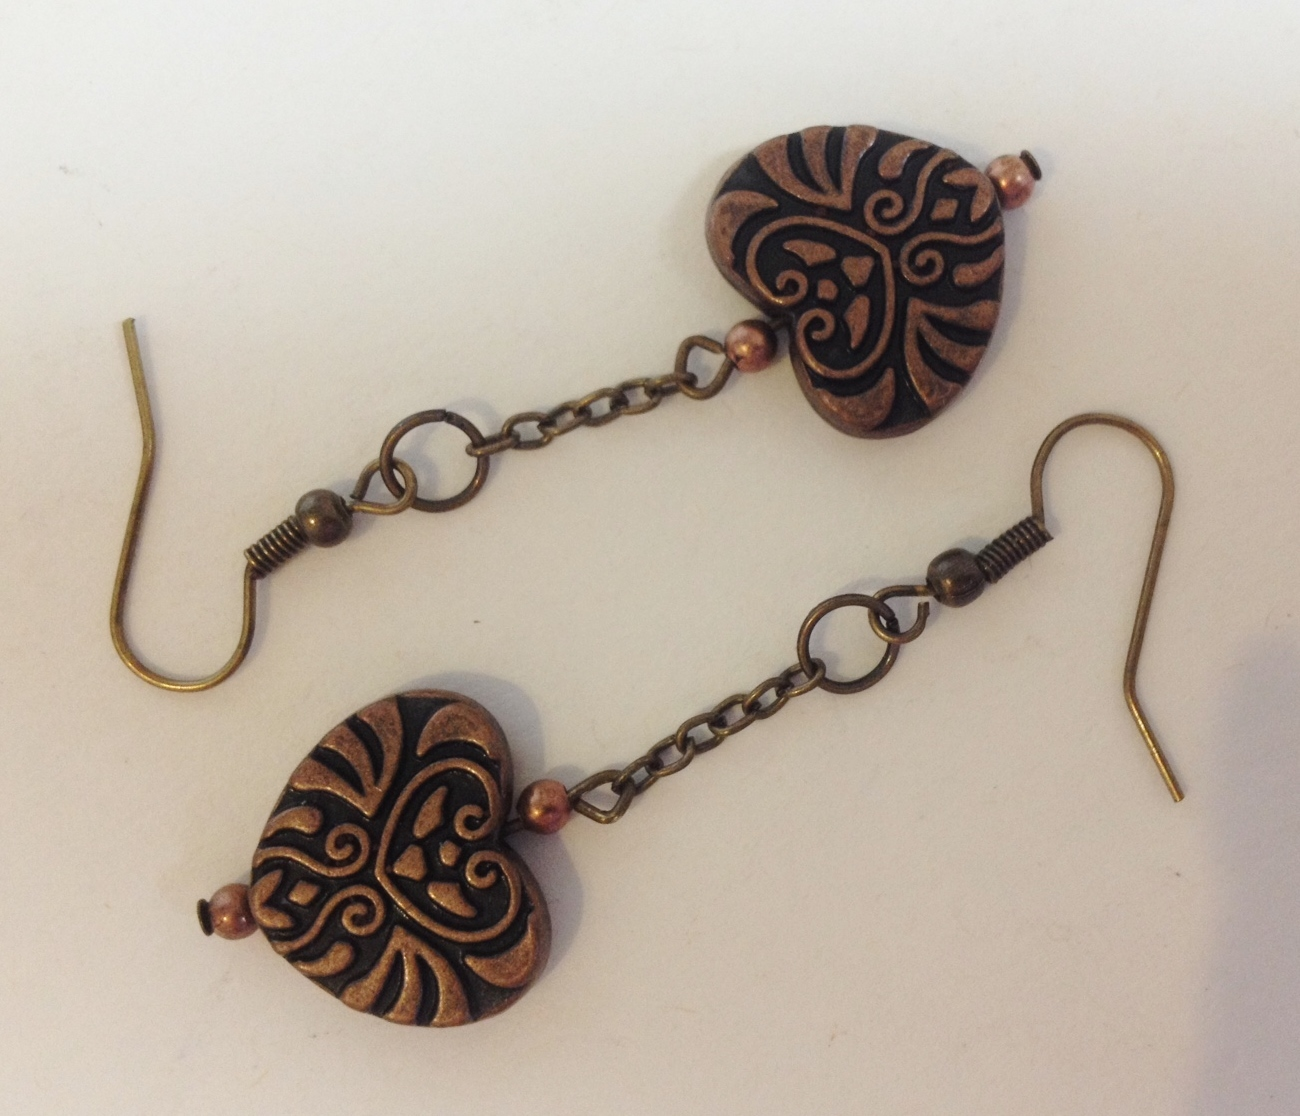 Antique Gold Copper Metal Heart Earrings Necklace Pendant Set Handmade Pierced